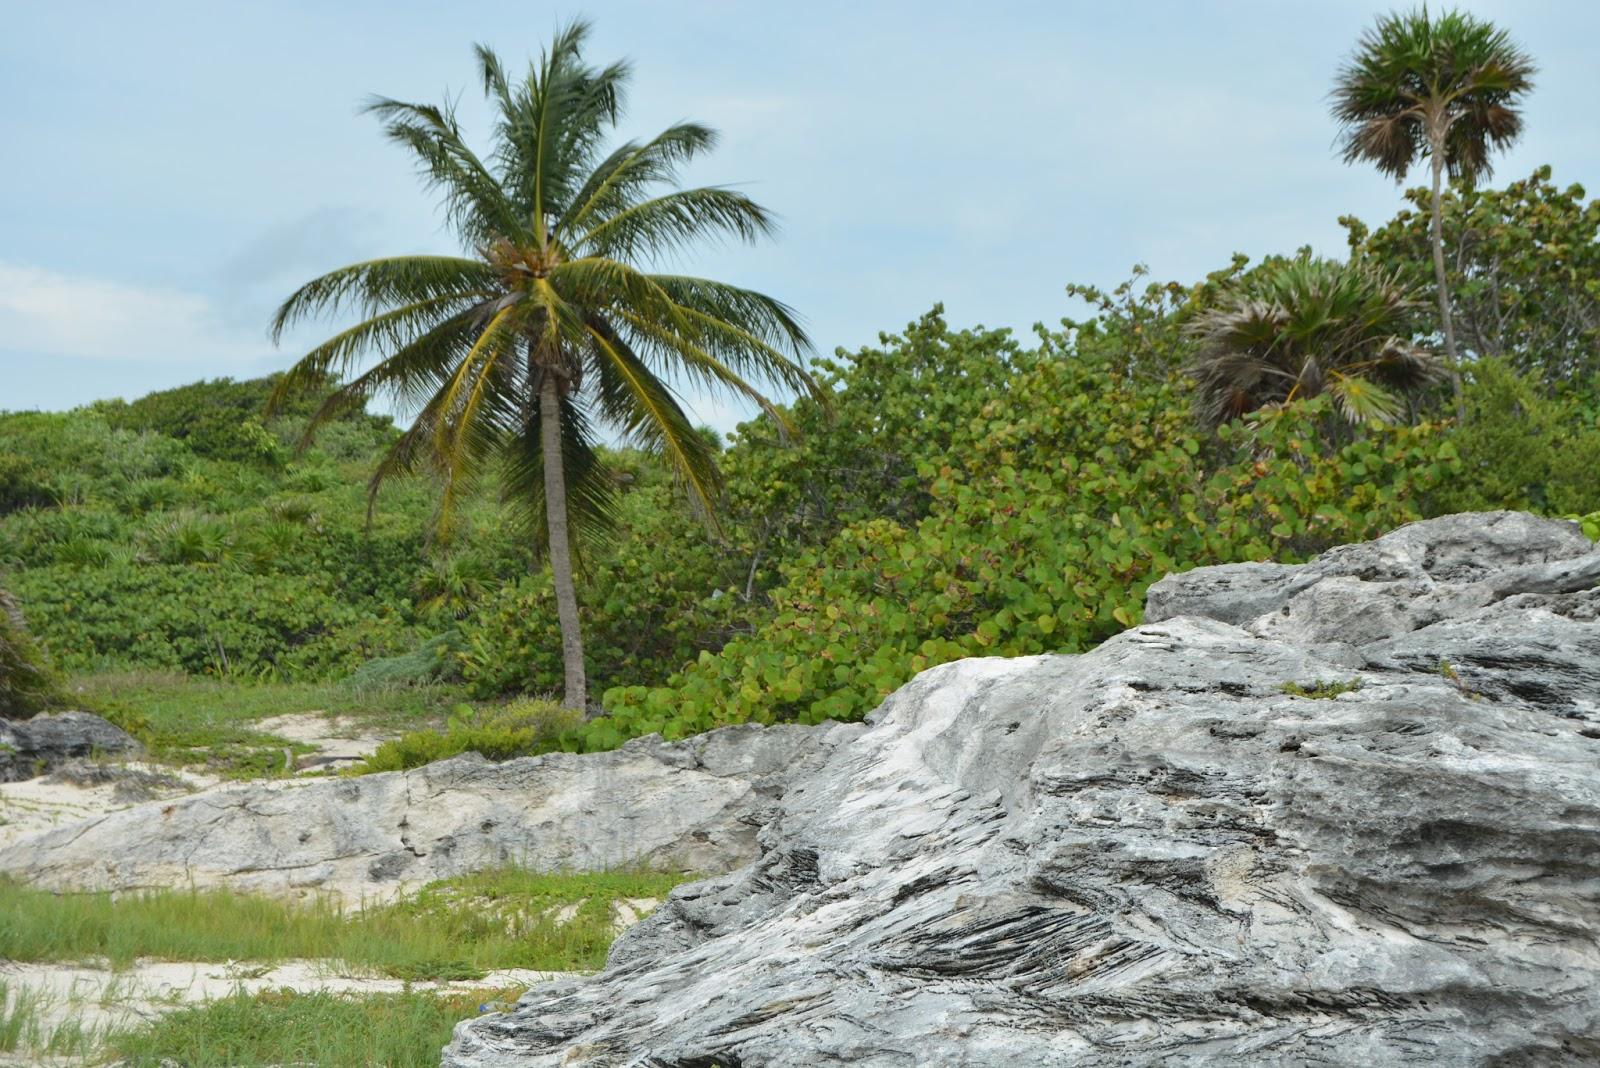 mexico, playacar, playa del carmen, travel, holiday, beaches, beach, Caribbean, palm trees, traveling